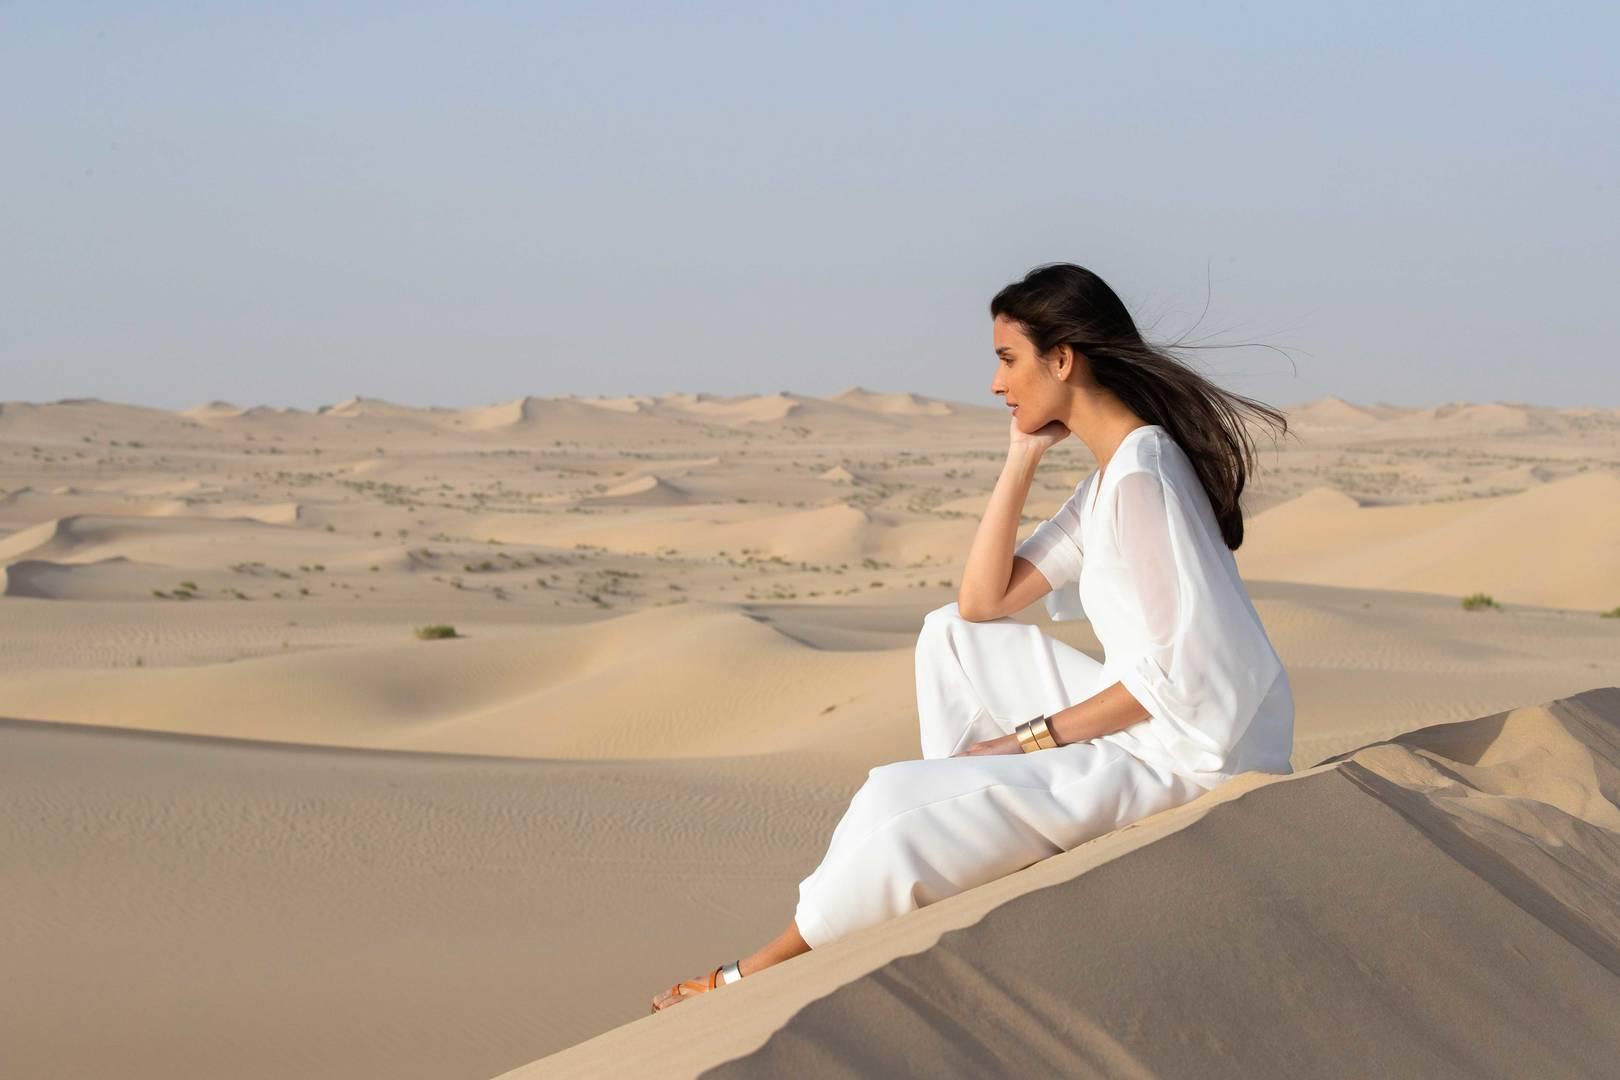 Lady sitting on the dune